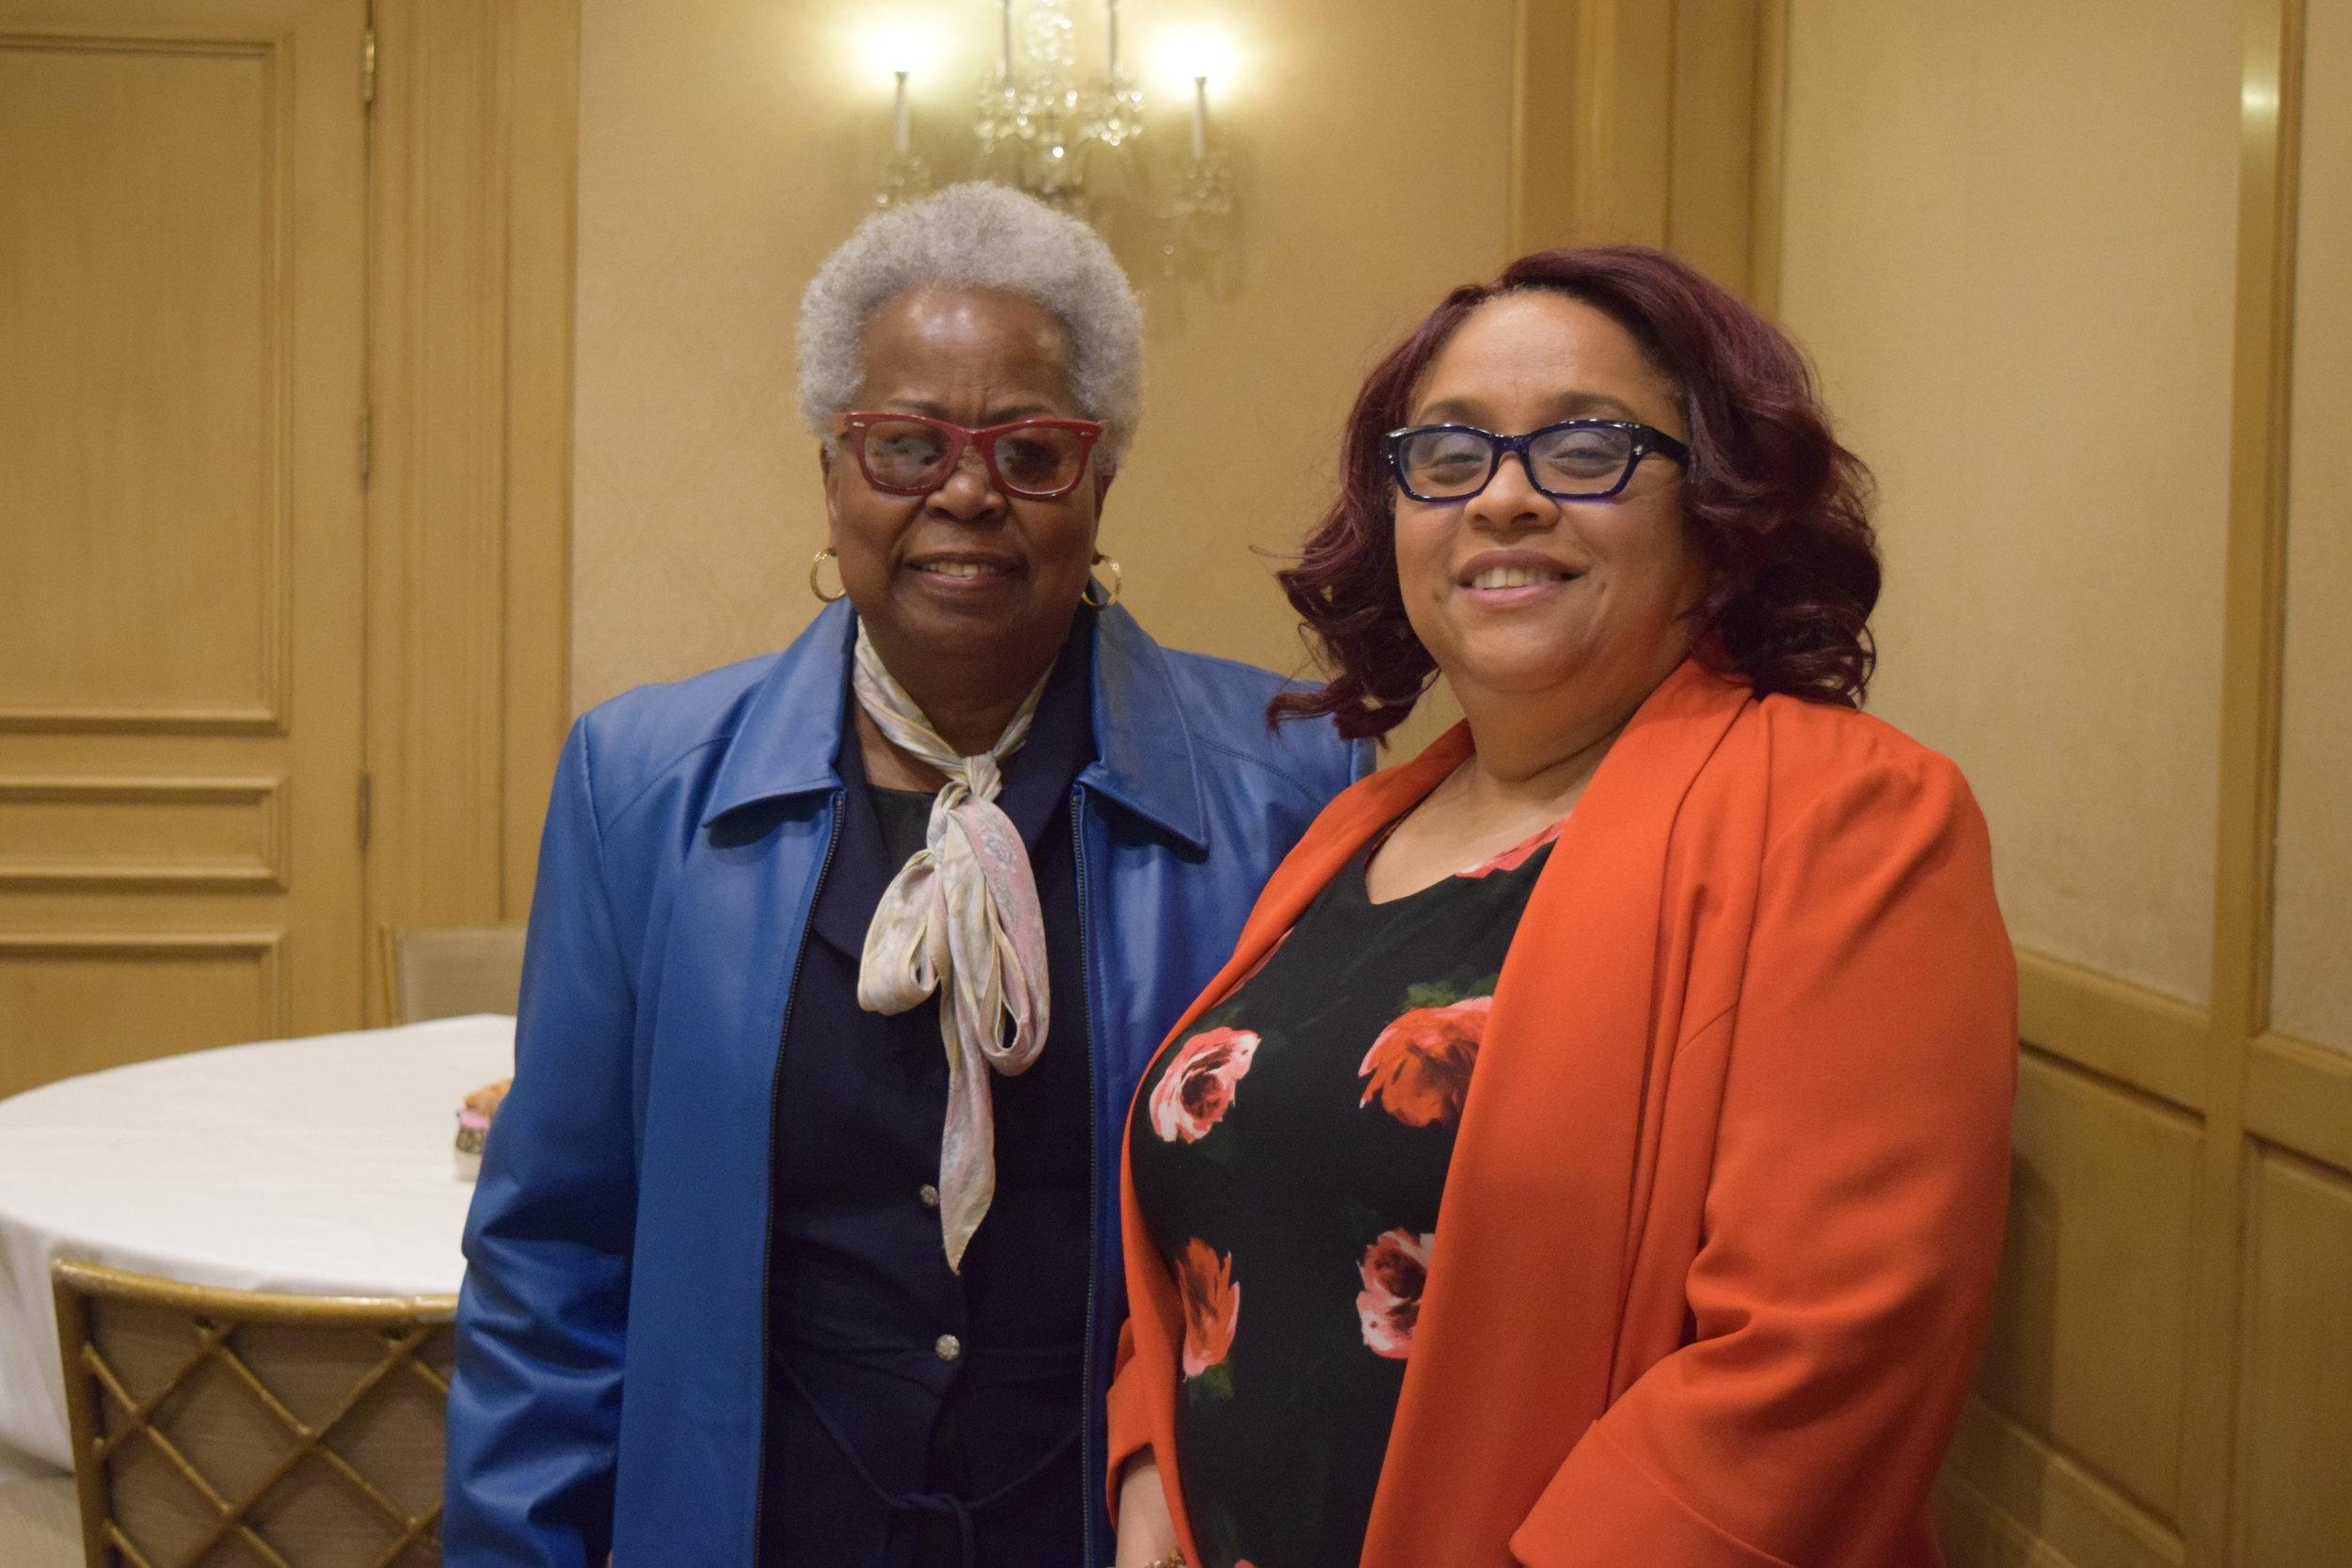 Lula Gardfrey with board member Dr. Andrea Pennington.